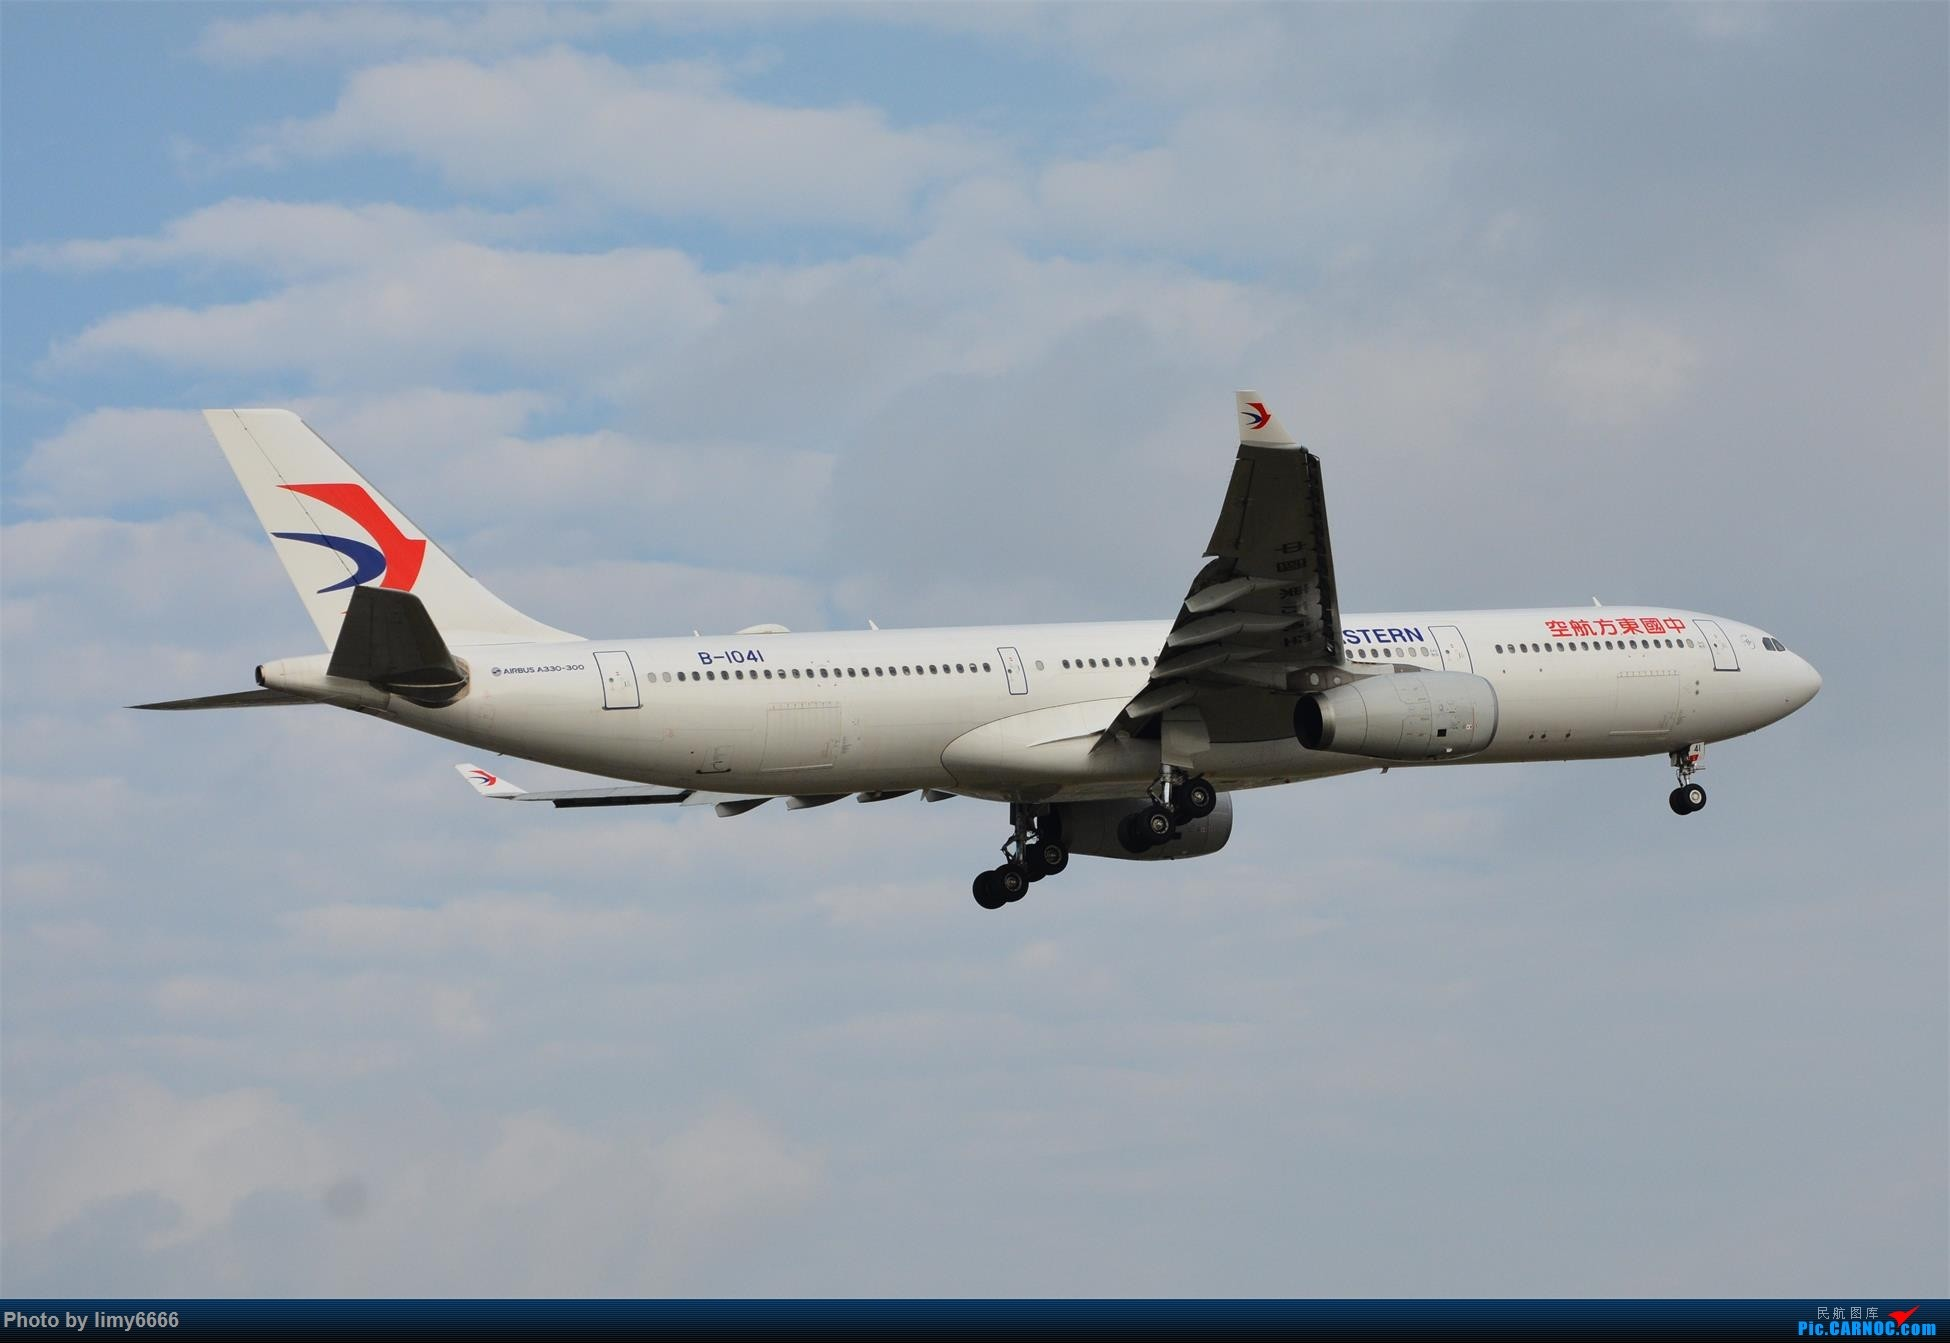 Re:[原创]上海虹桥机场拍机(在贵阳很少见或看不见的) AIRBUS A330-300 B-1041 中国上海虹桥国际机场